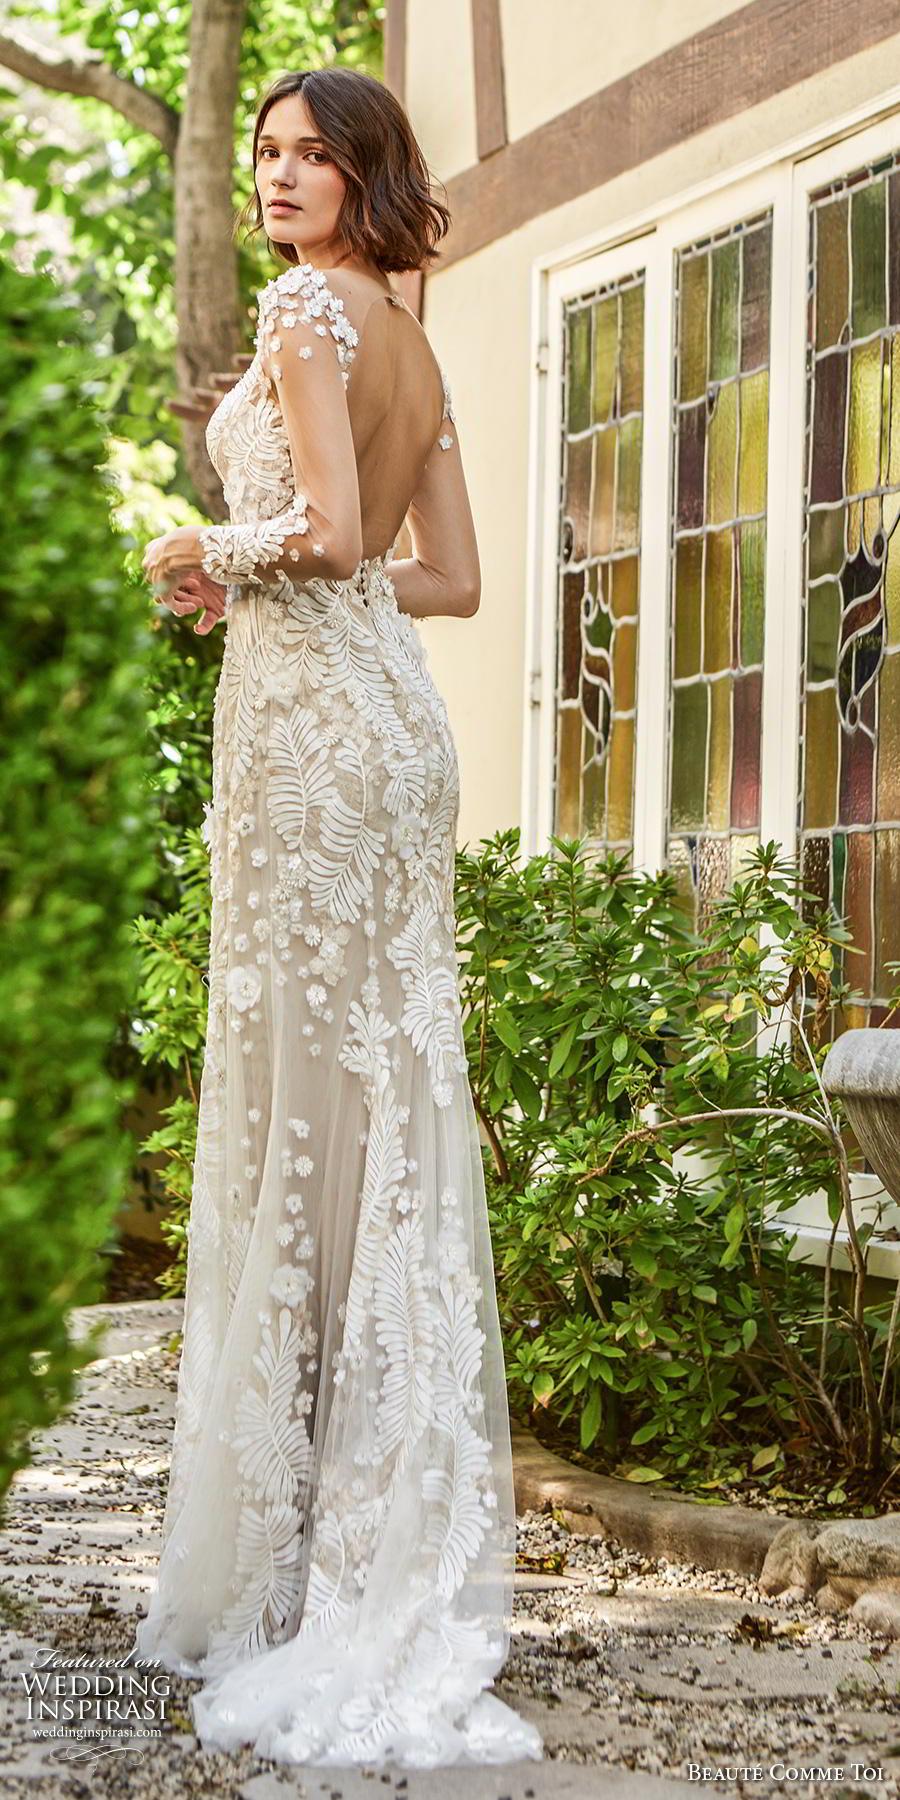 beaute comme toi f2020 bridal long sleeves illusion bateau neckline full embellishment elegant sheath wedding dress backless low back short train (daphne) bv